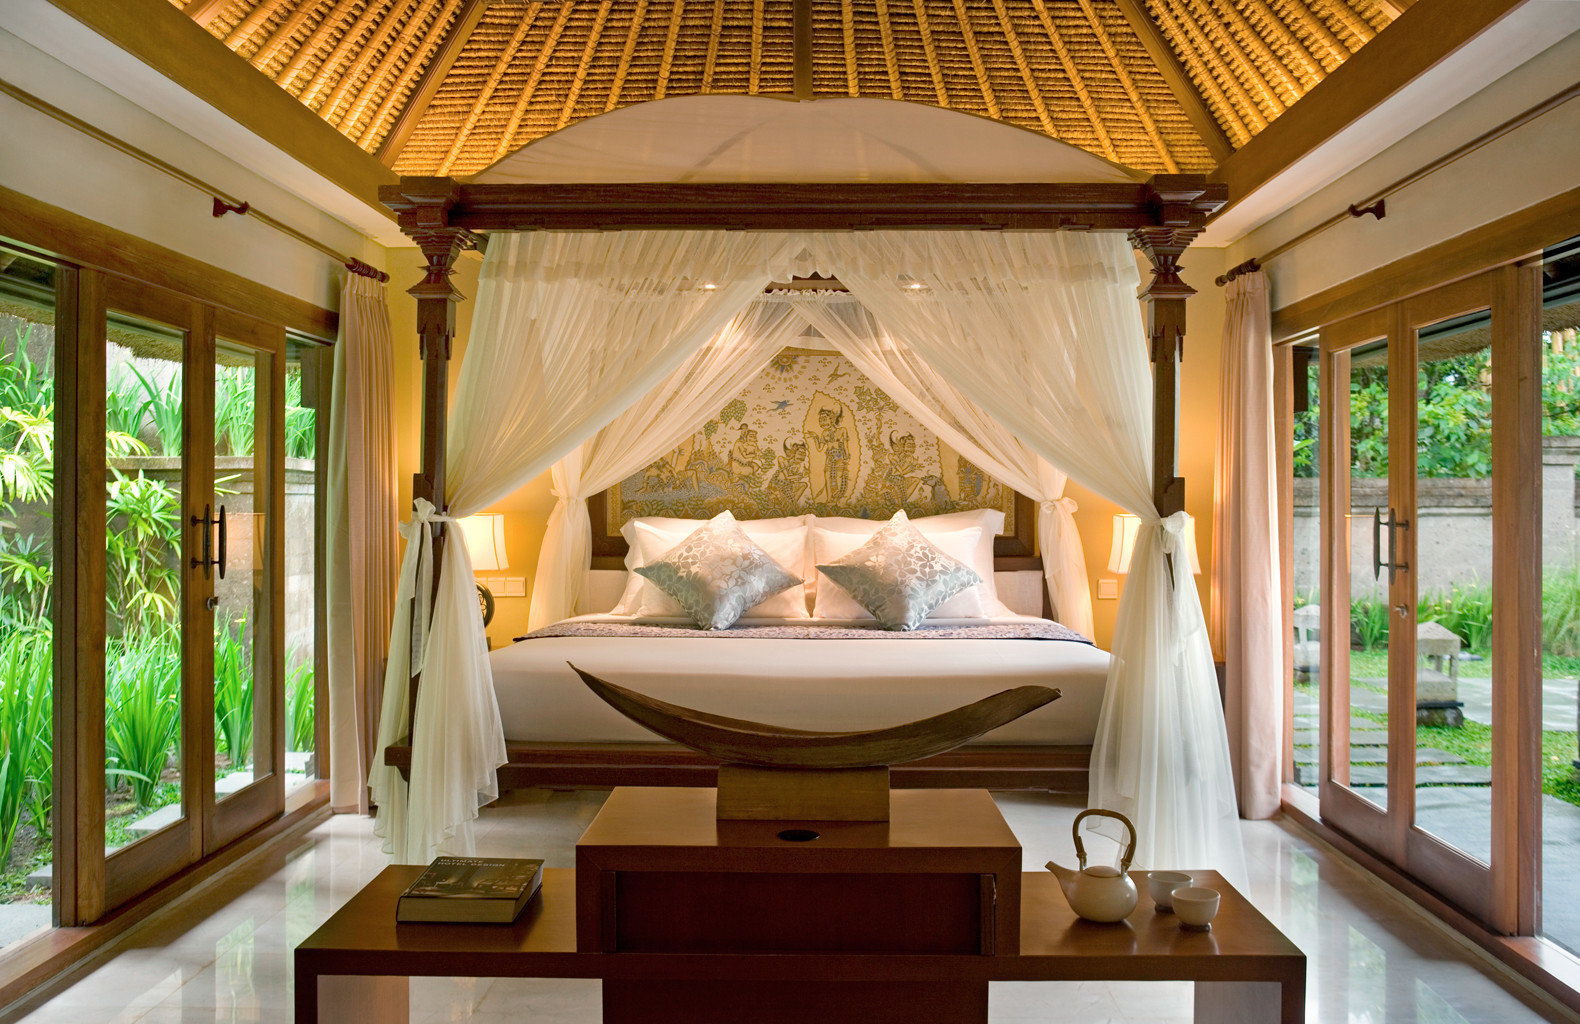 Bedroom Cultural Eco Elegant Jungle Patio Resort Villa Wellness property home cottage mansion porch living room tub